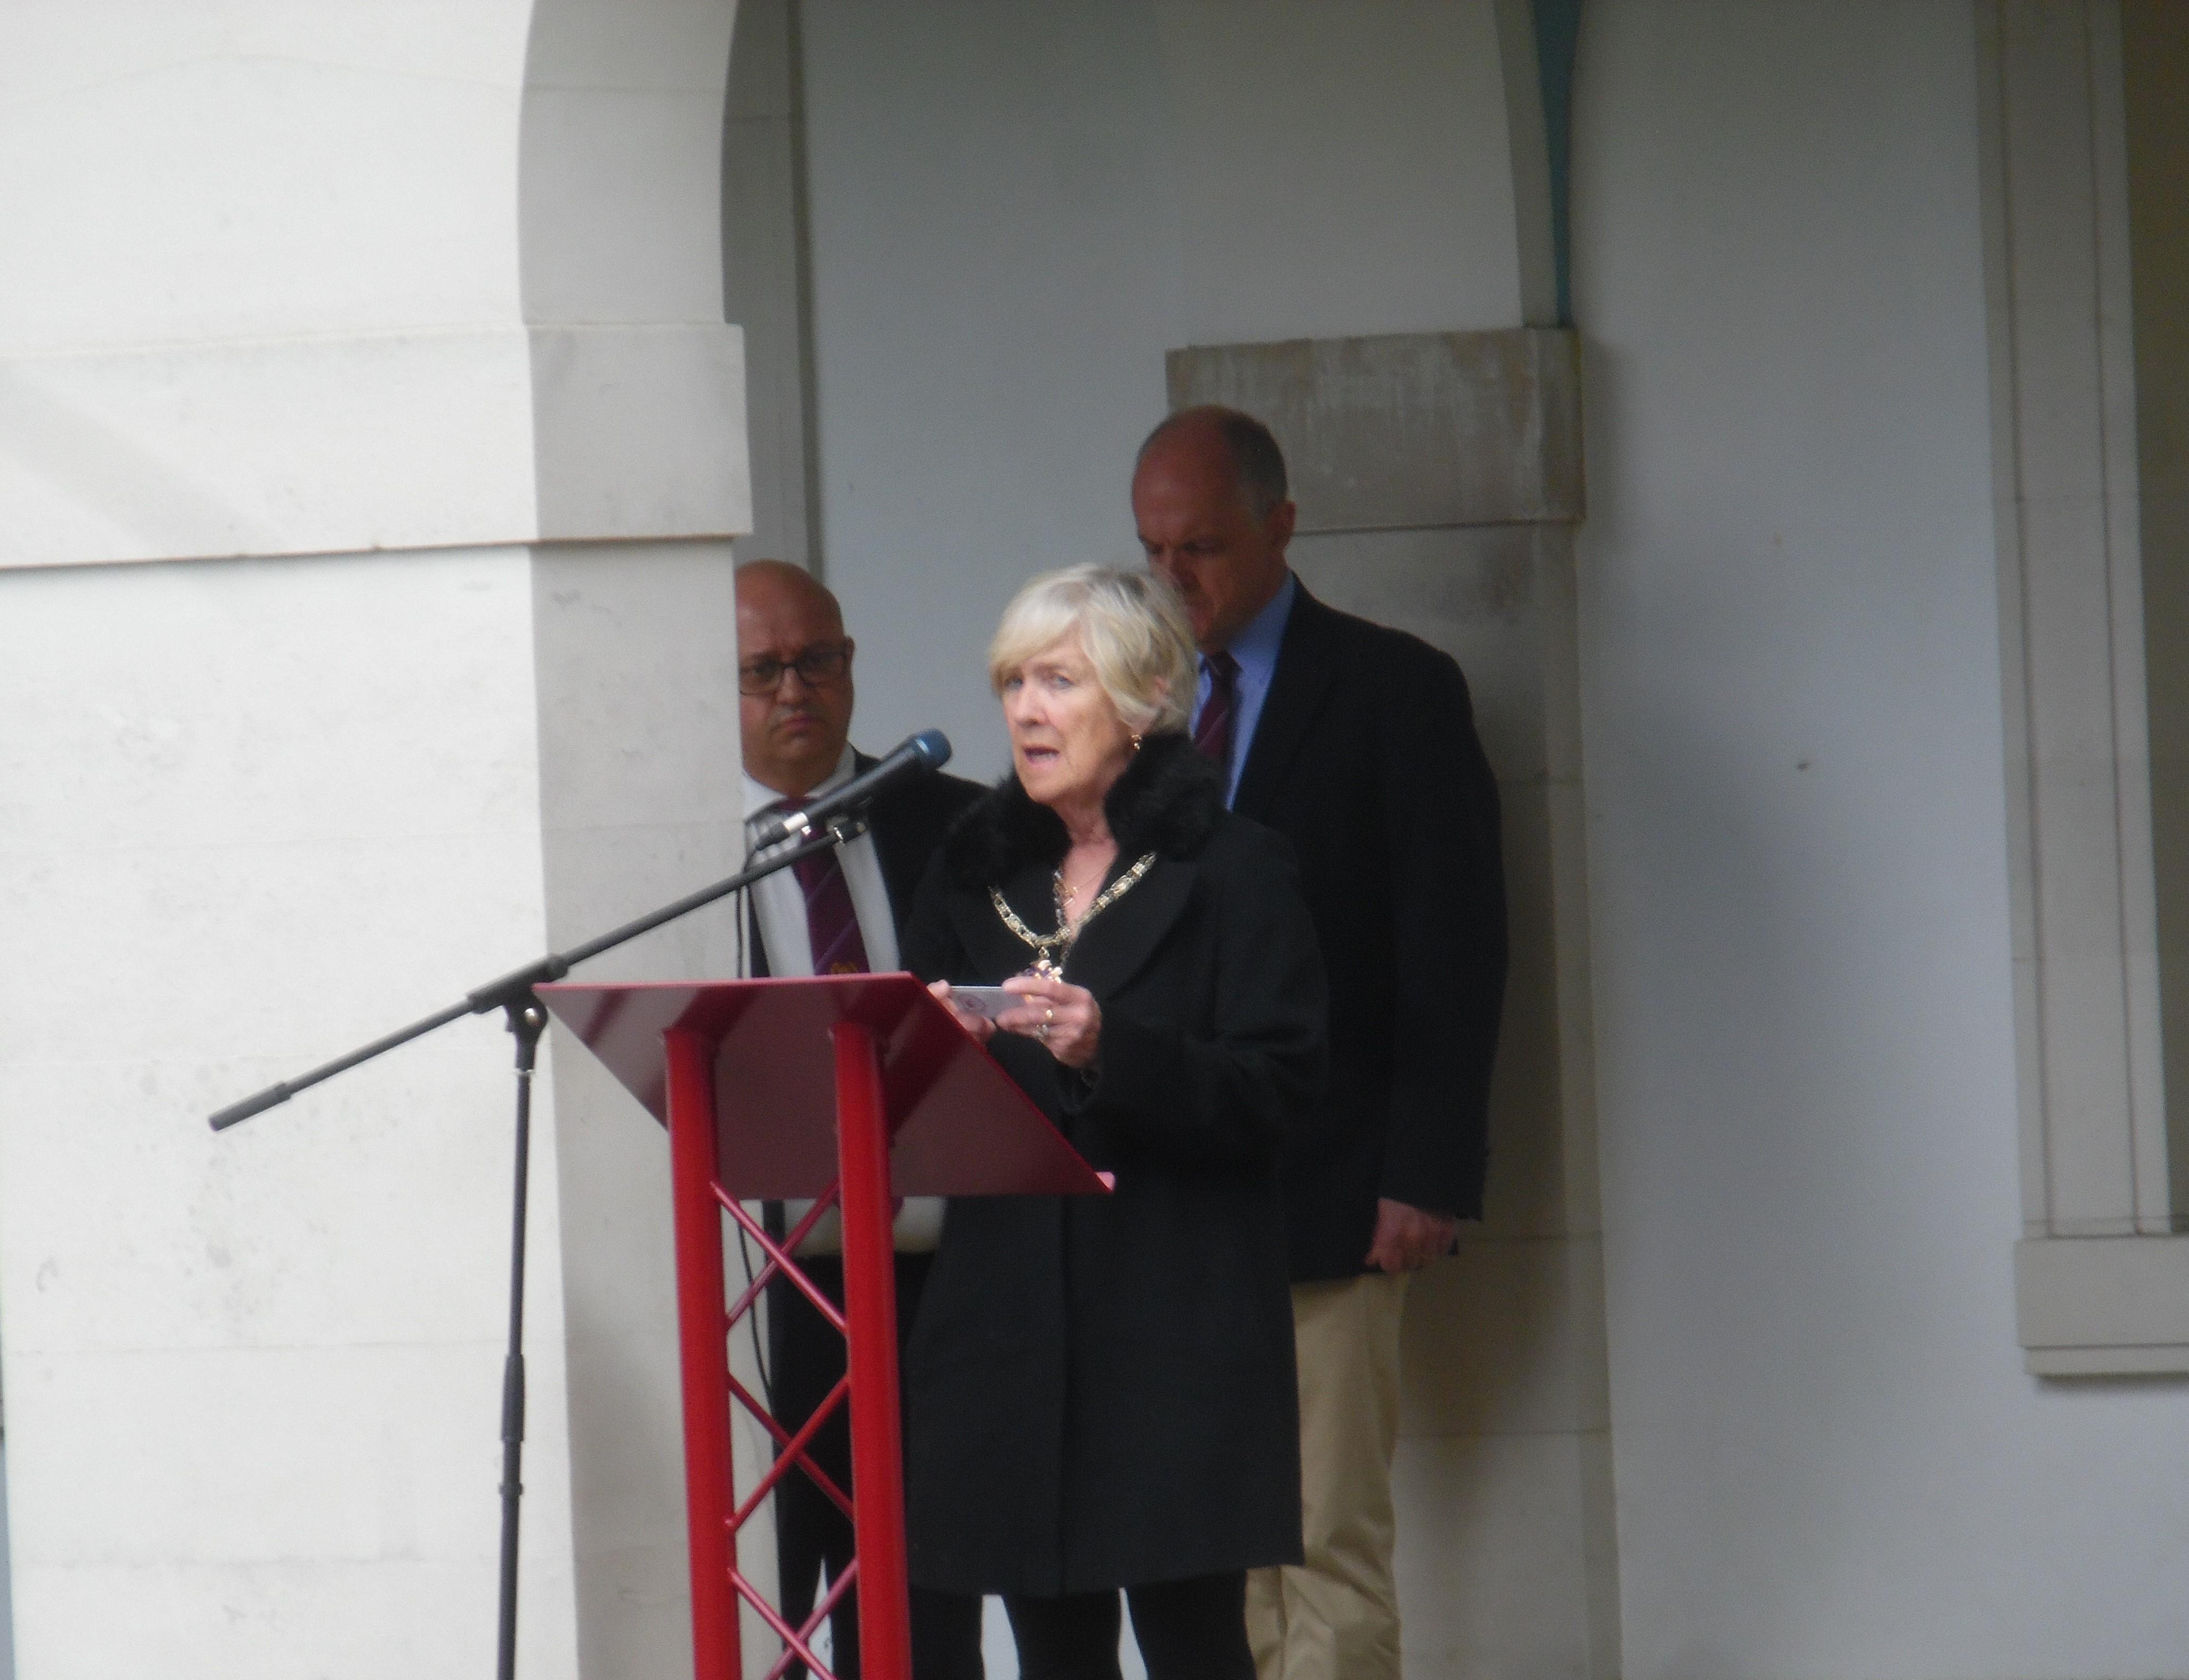 Mayor of Woking, Cllr Beryl Hunwicks